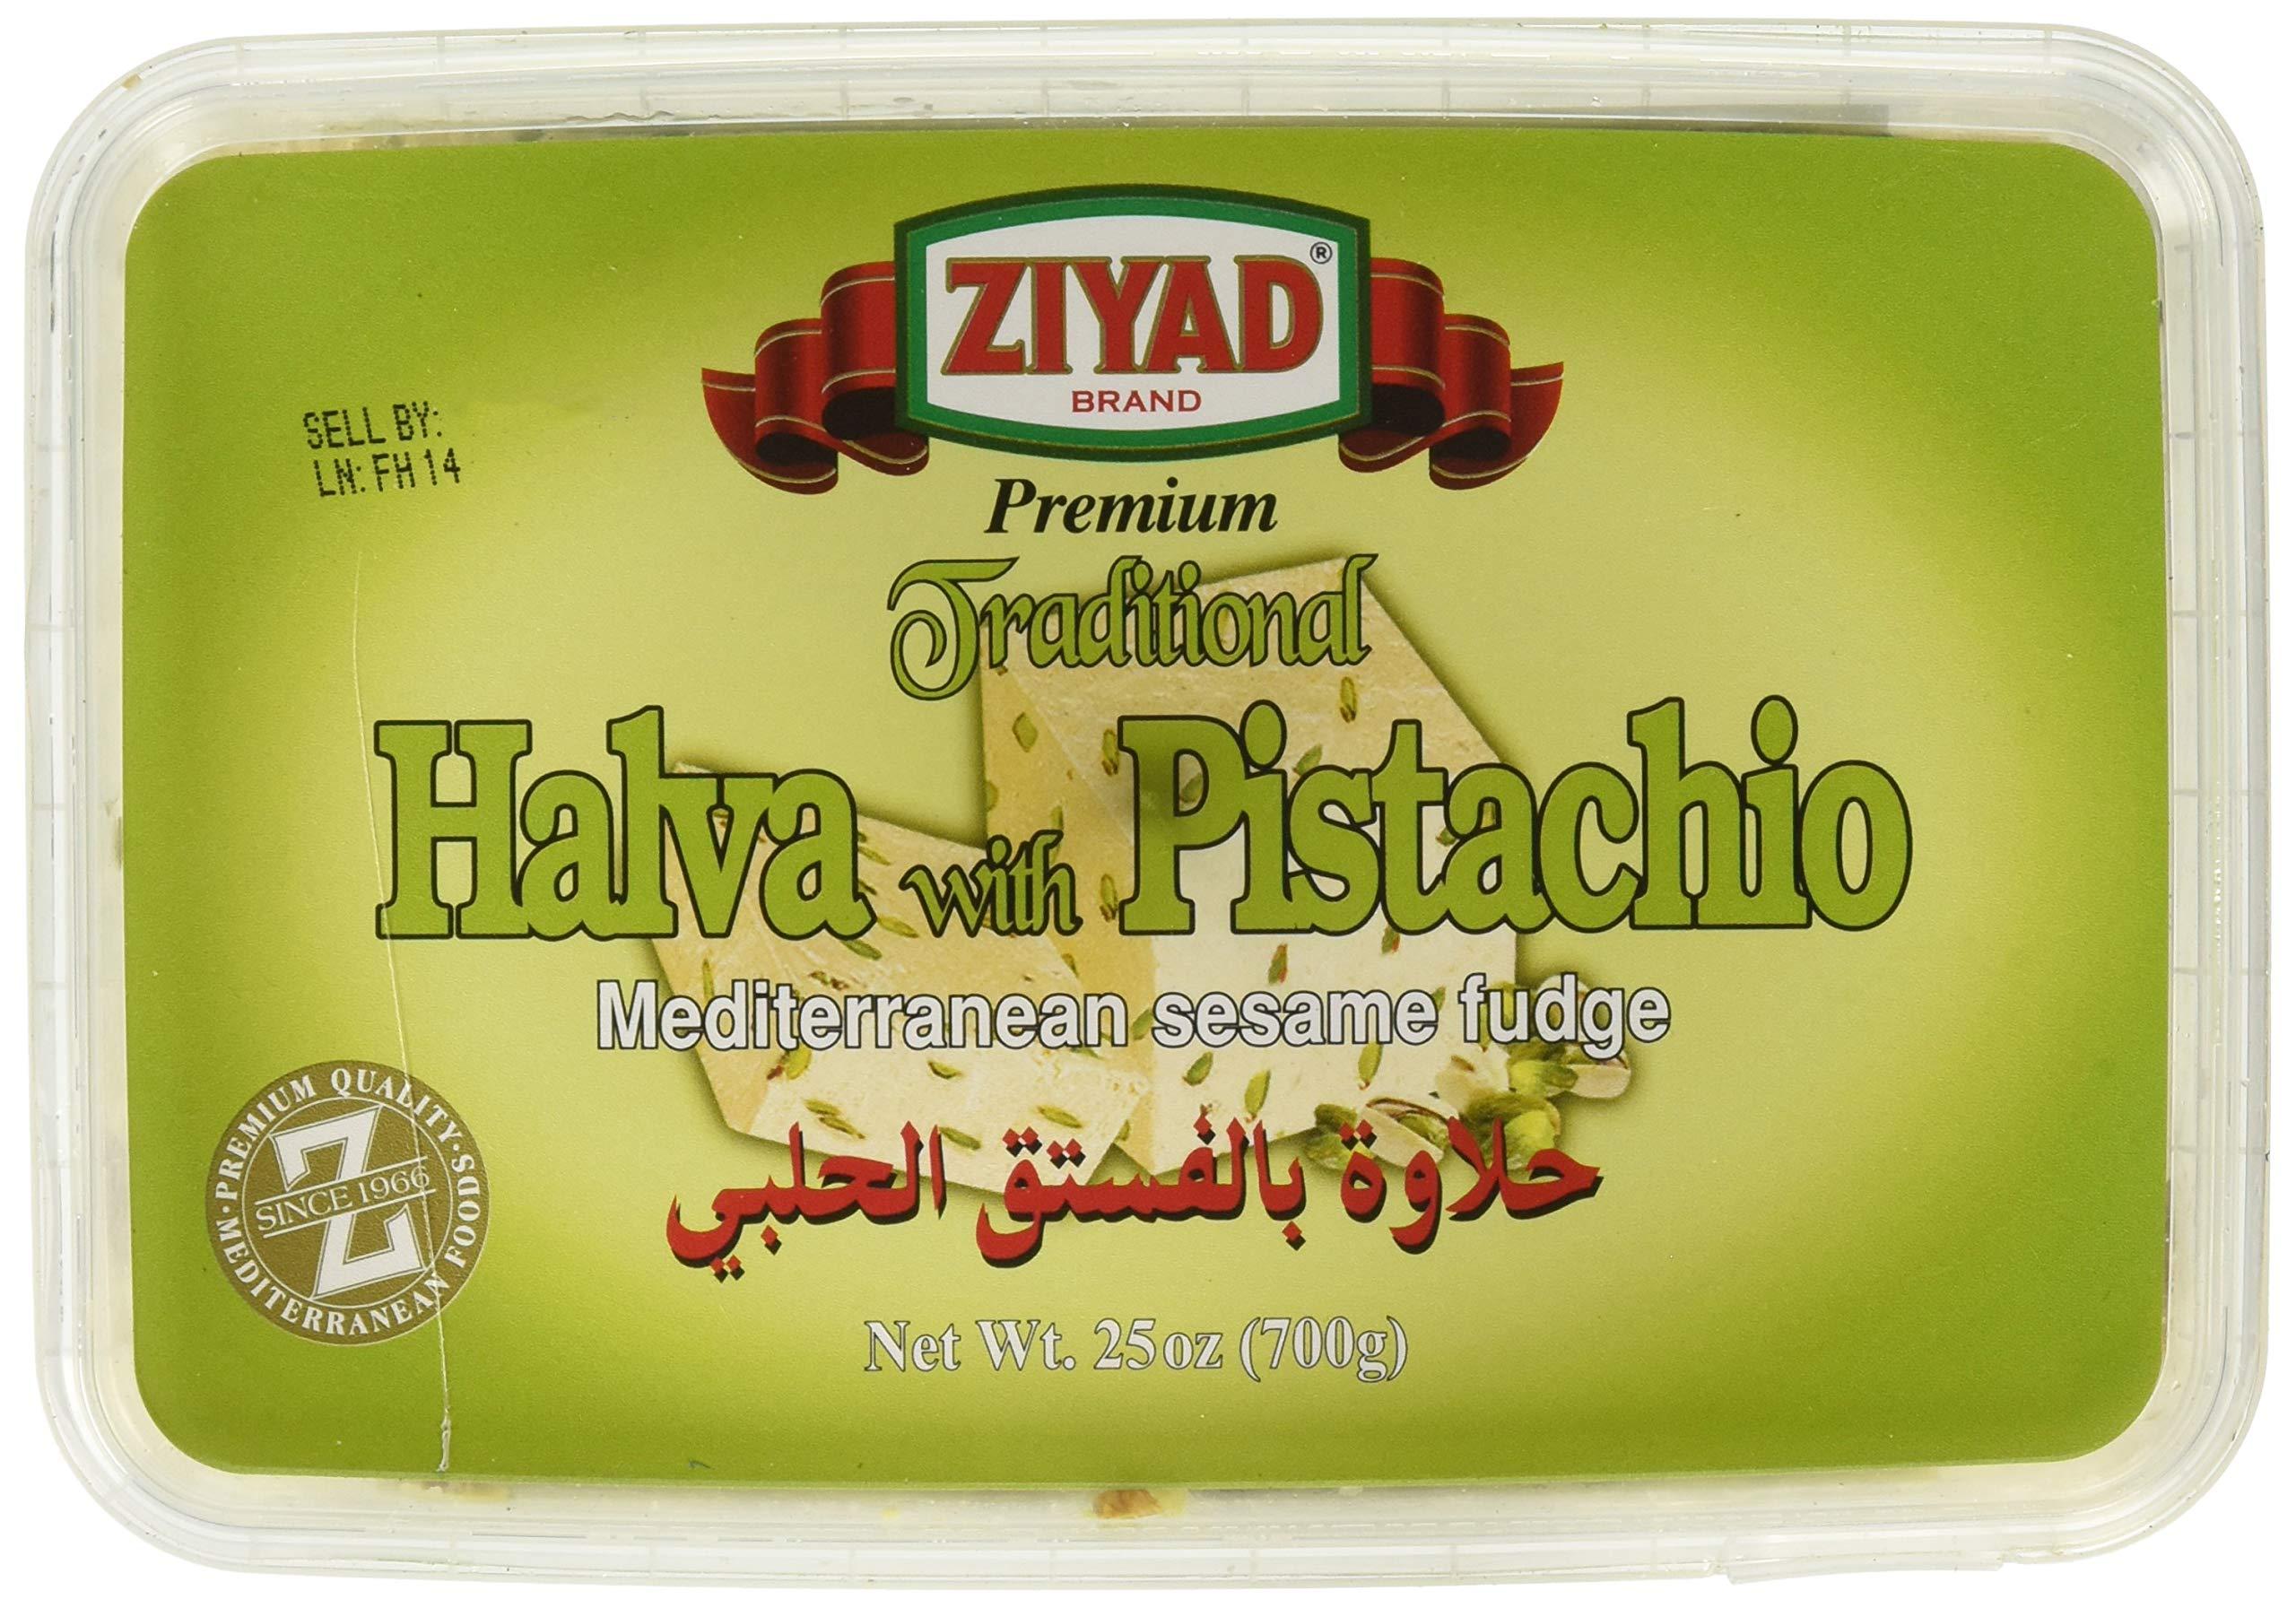 Ziyad Halva with Pistachio 700 gm, (Pack 1) by Ziyad